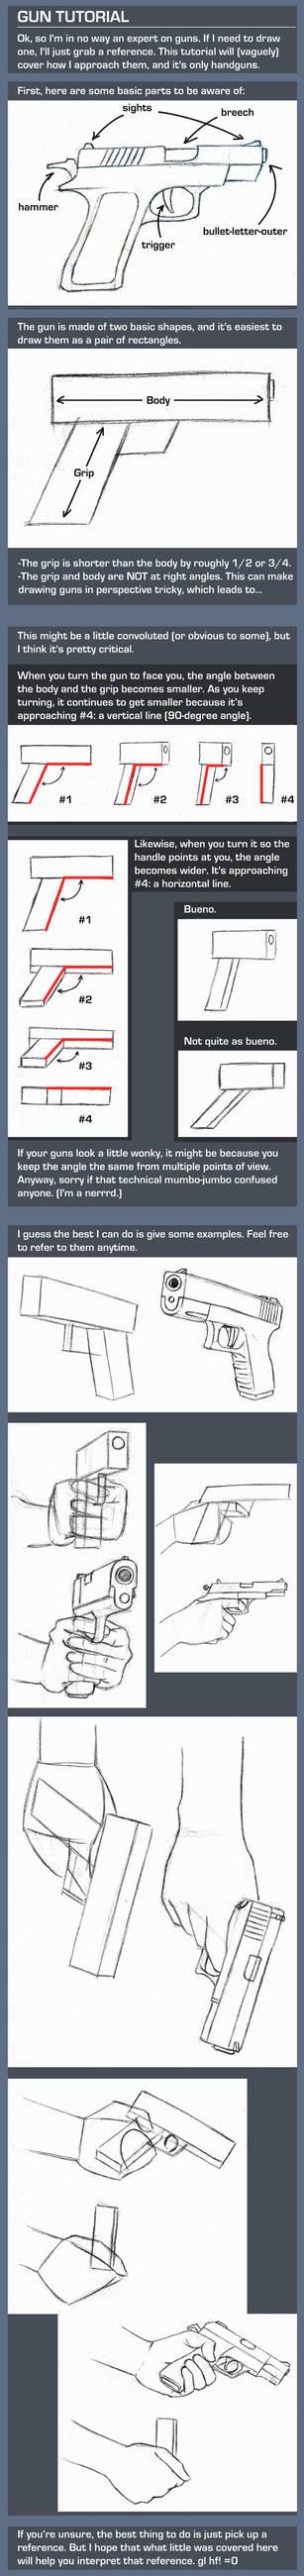 Gun 'Tutorial'